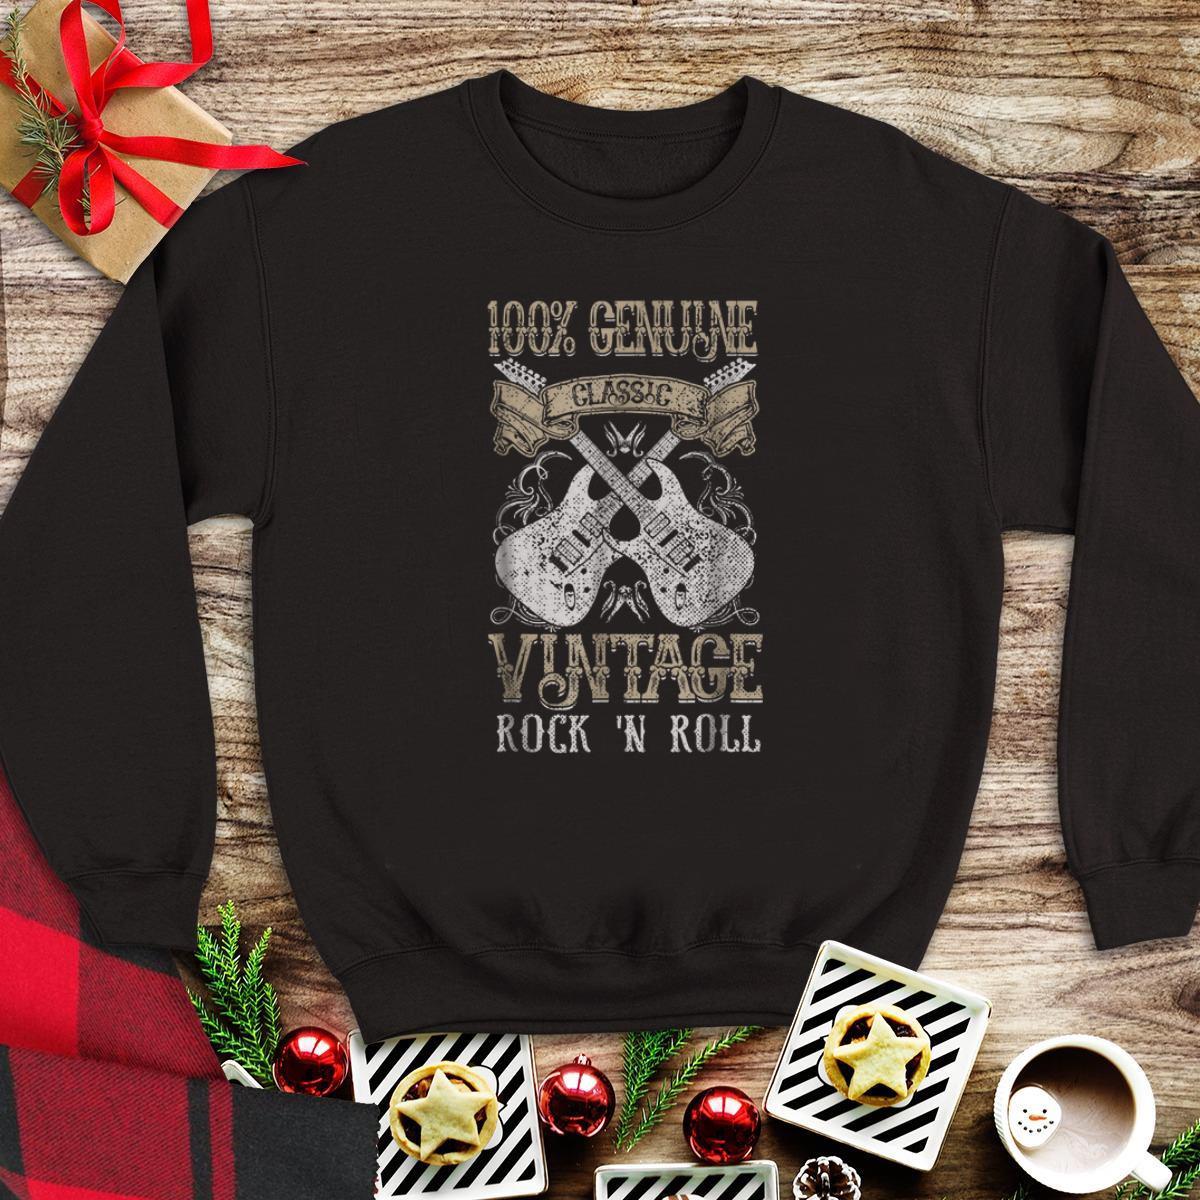 100 Genune Class Guitar Electric Vintage Rock N Roll sweater 1 - 100% Genune Class Guitar Electric Vintage Rock N Roll sweater